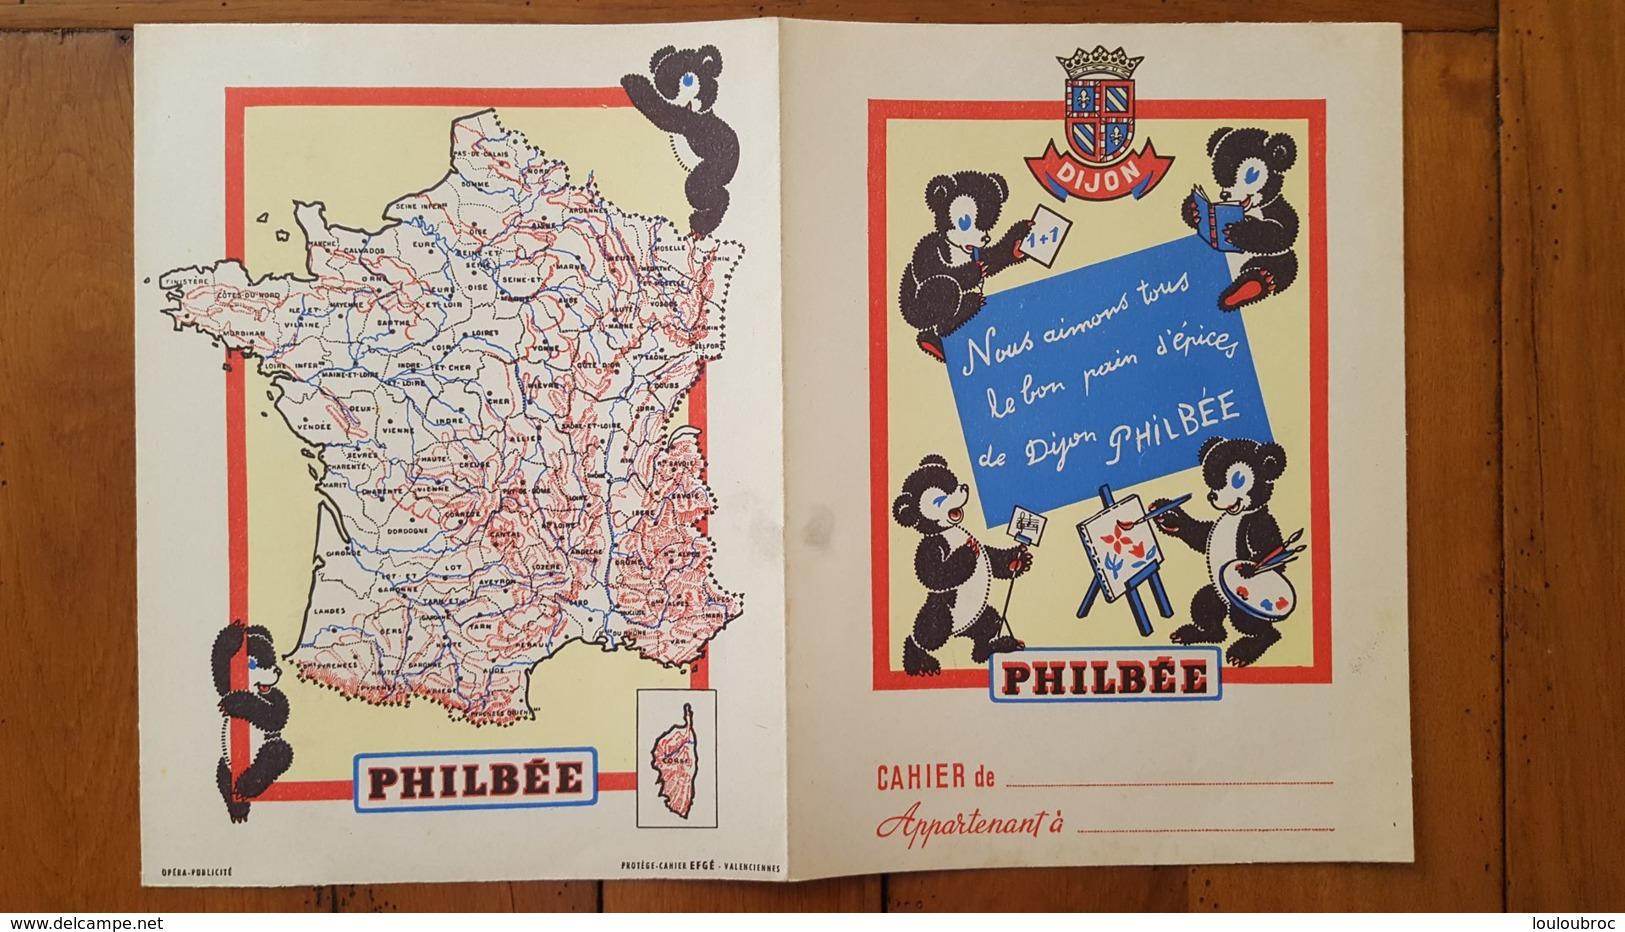 PROTEGE CAHIER PAIN D'EPICES DE DIJON PHILBEE - Gingerbread